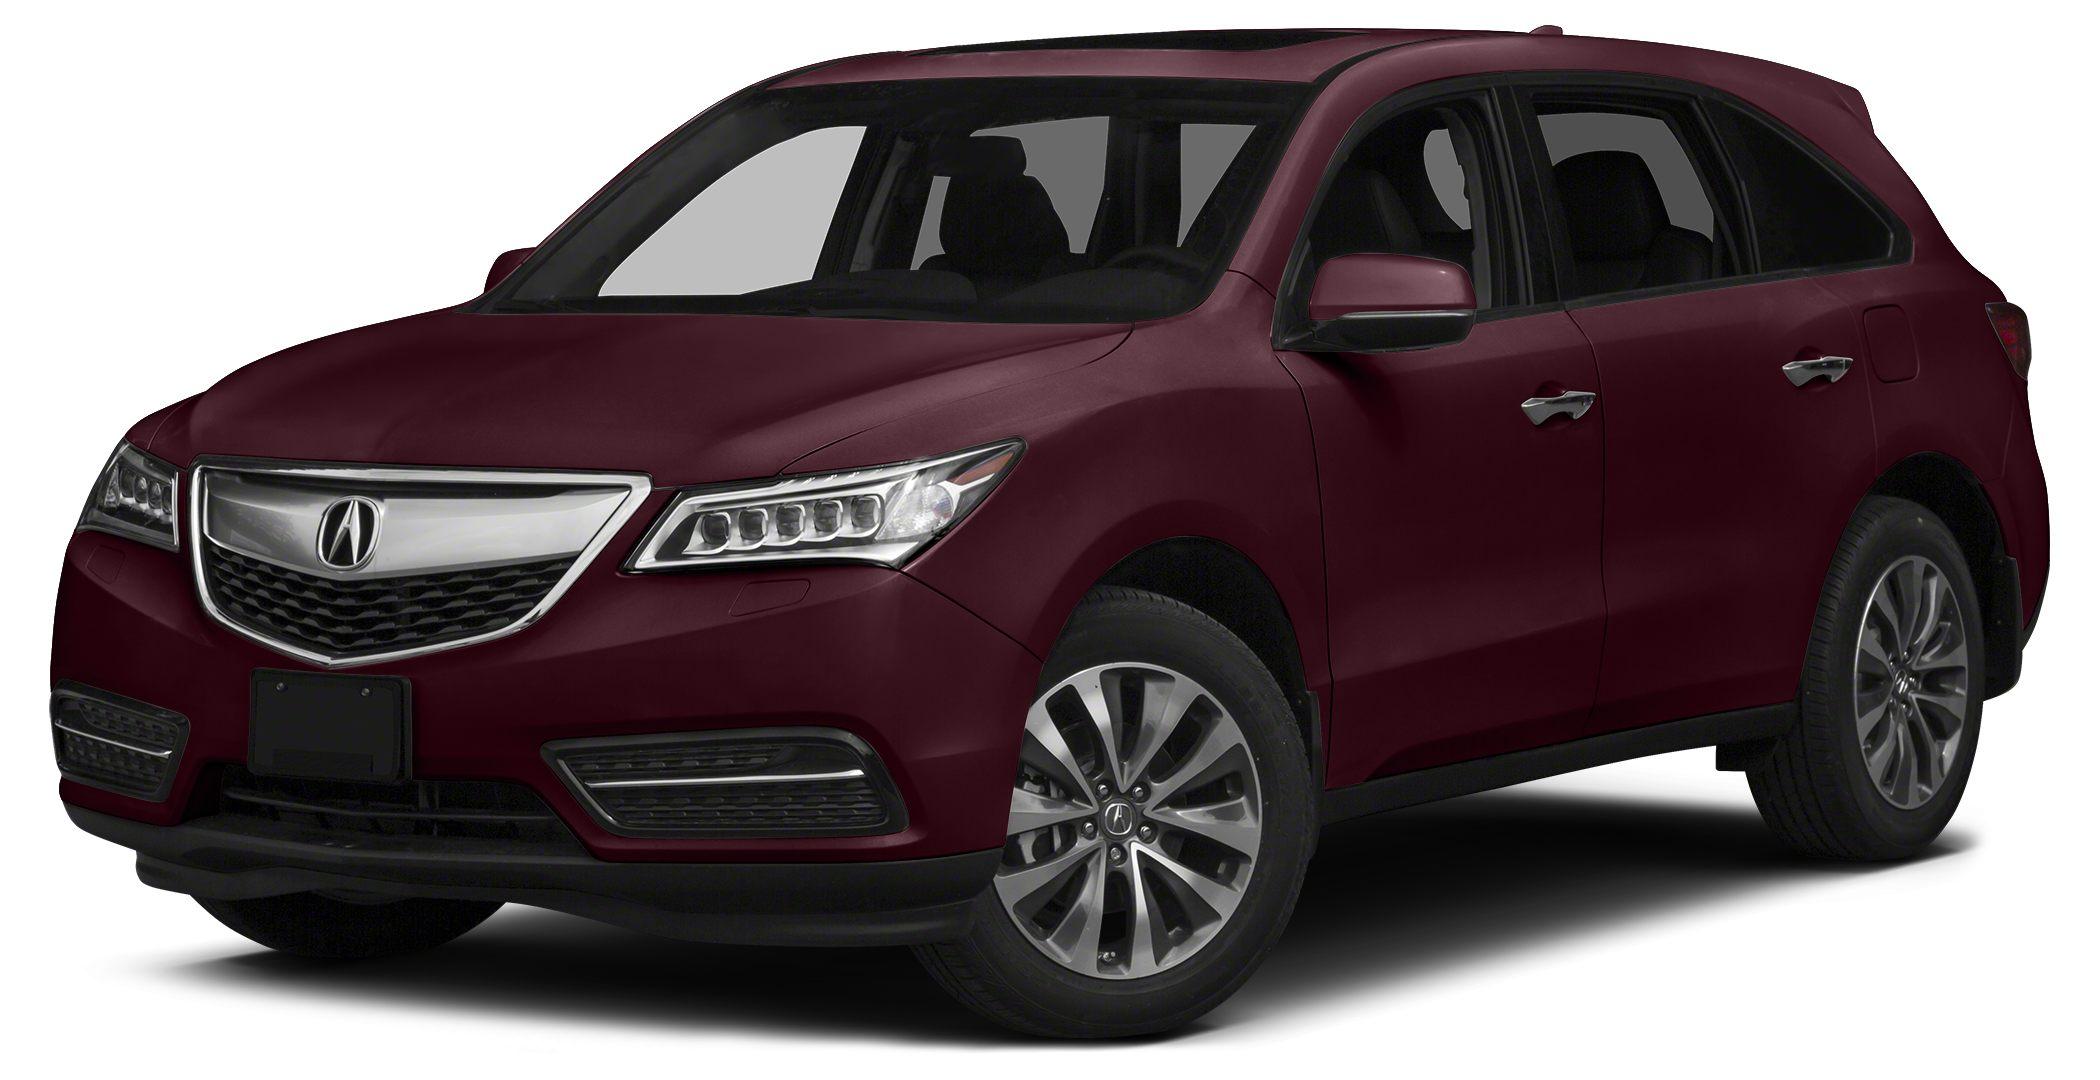 2015 Acura MDX 35 Technology Miles 73Color Dark Cherry Pearl Stock A022181 VIN 5FRYD4H48FB02